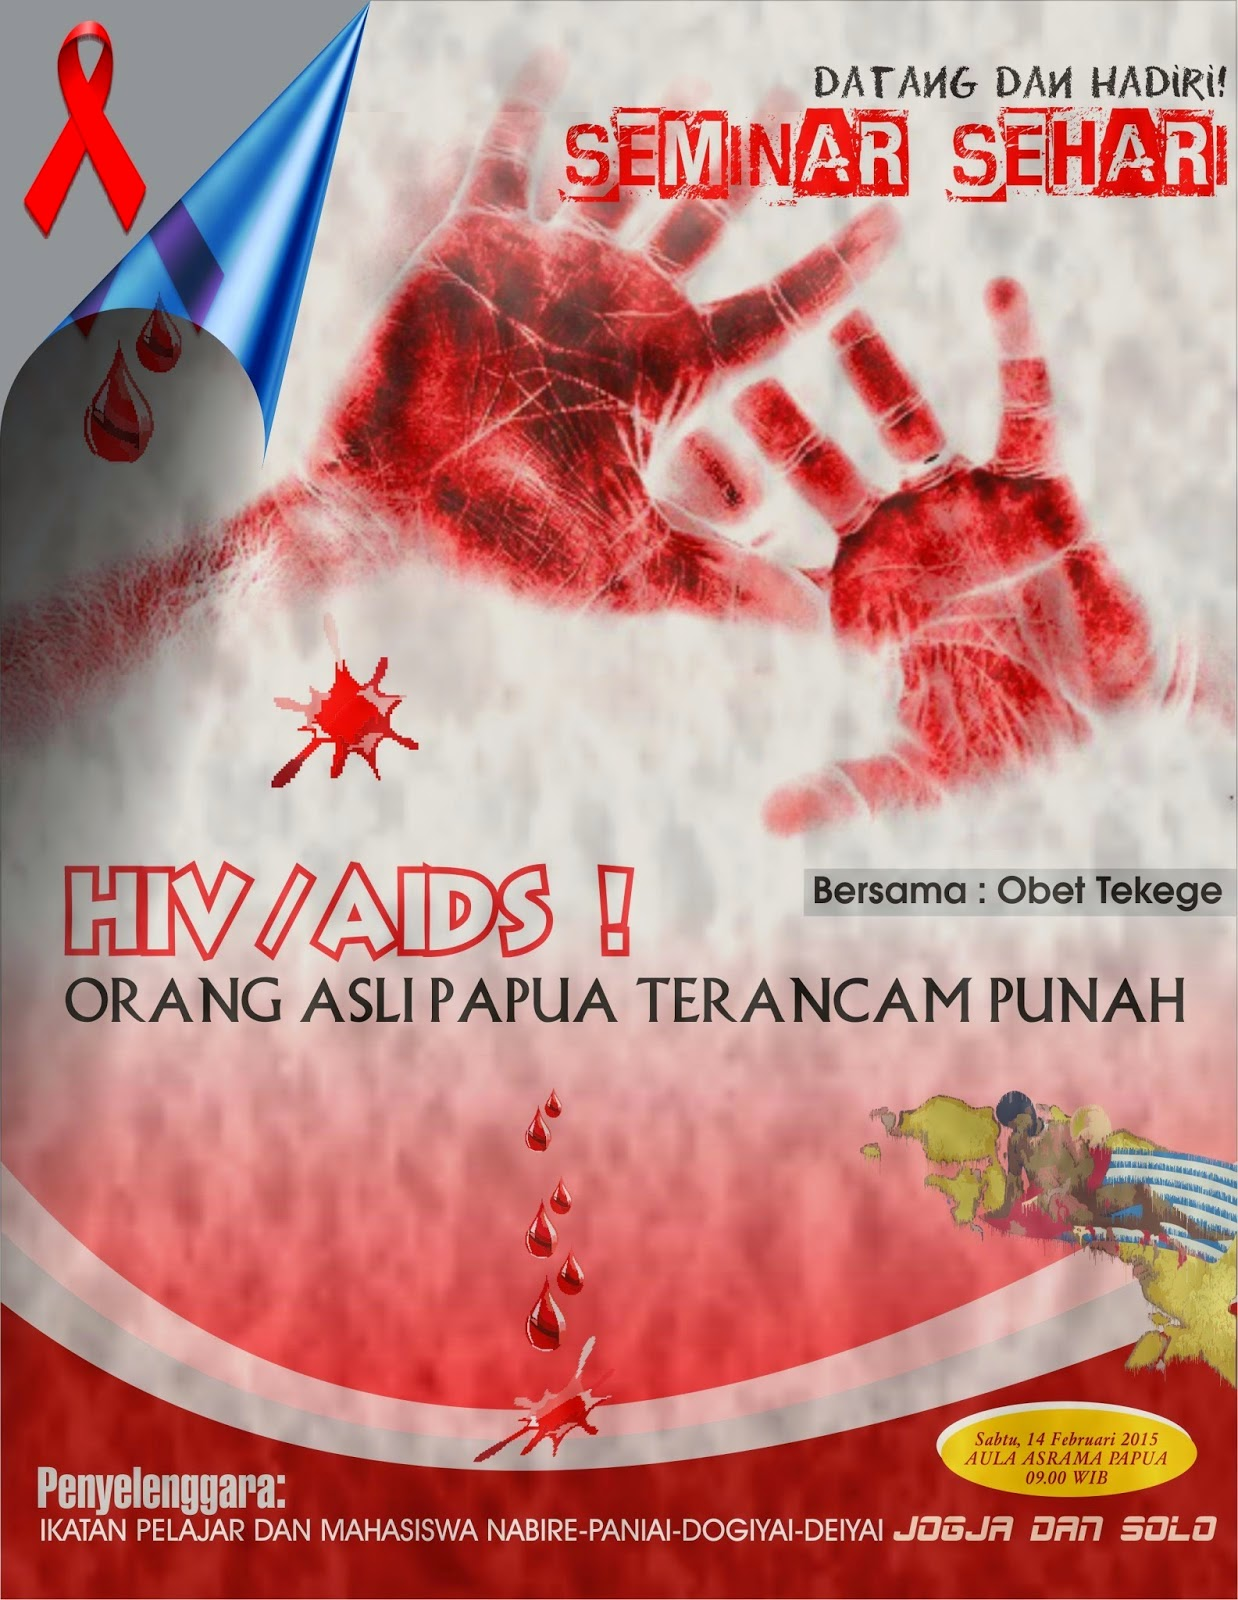 Ugai Piyauto Brosur Seminar Sehari Hiv Aids Oap Terancam Punah